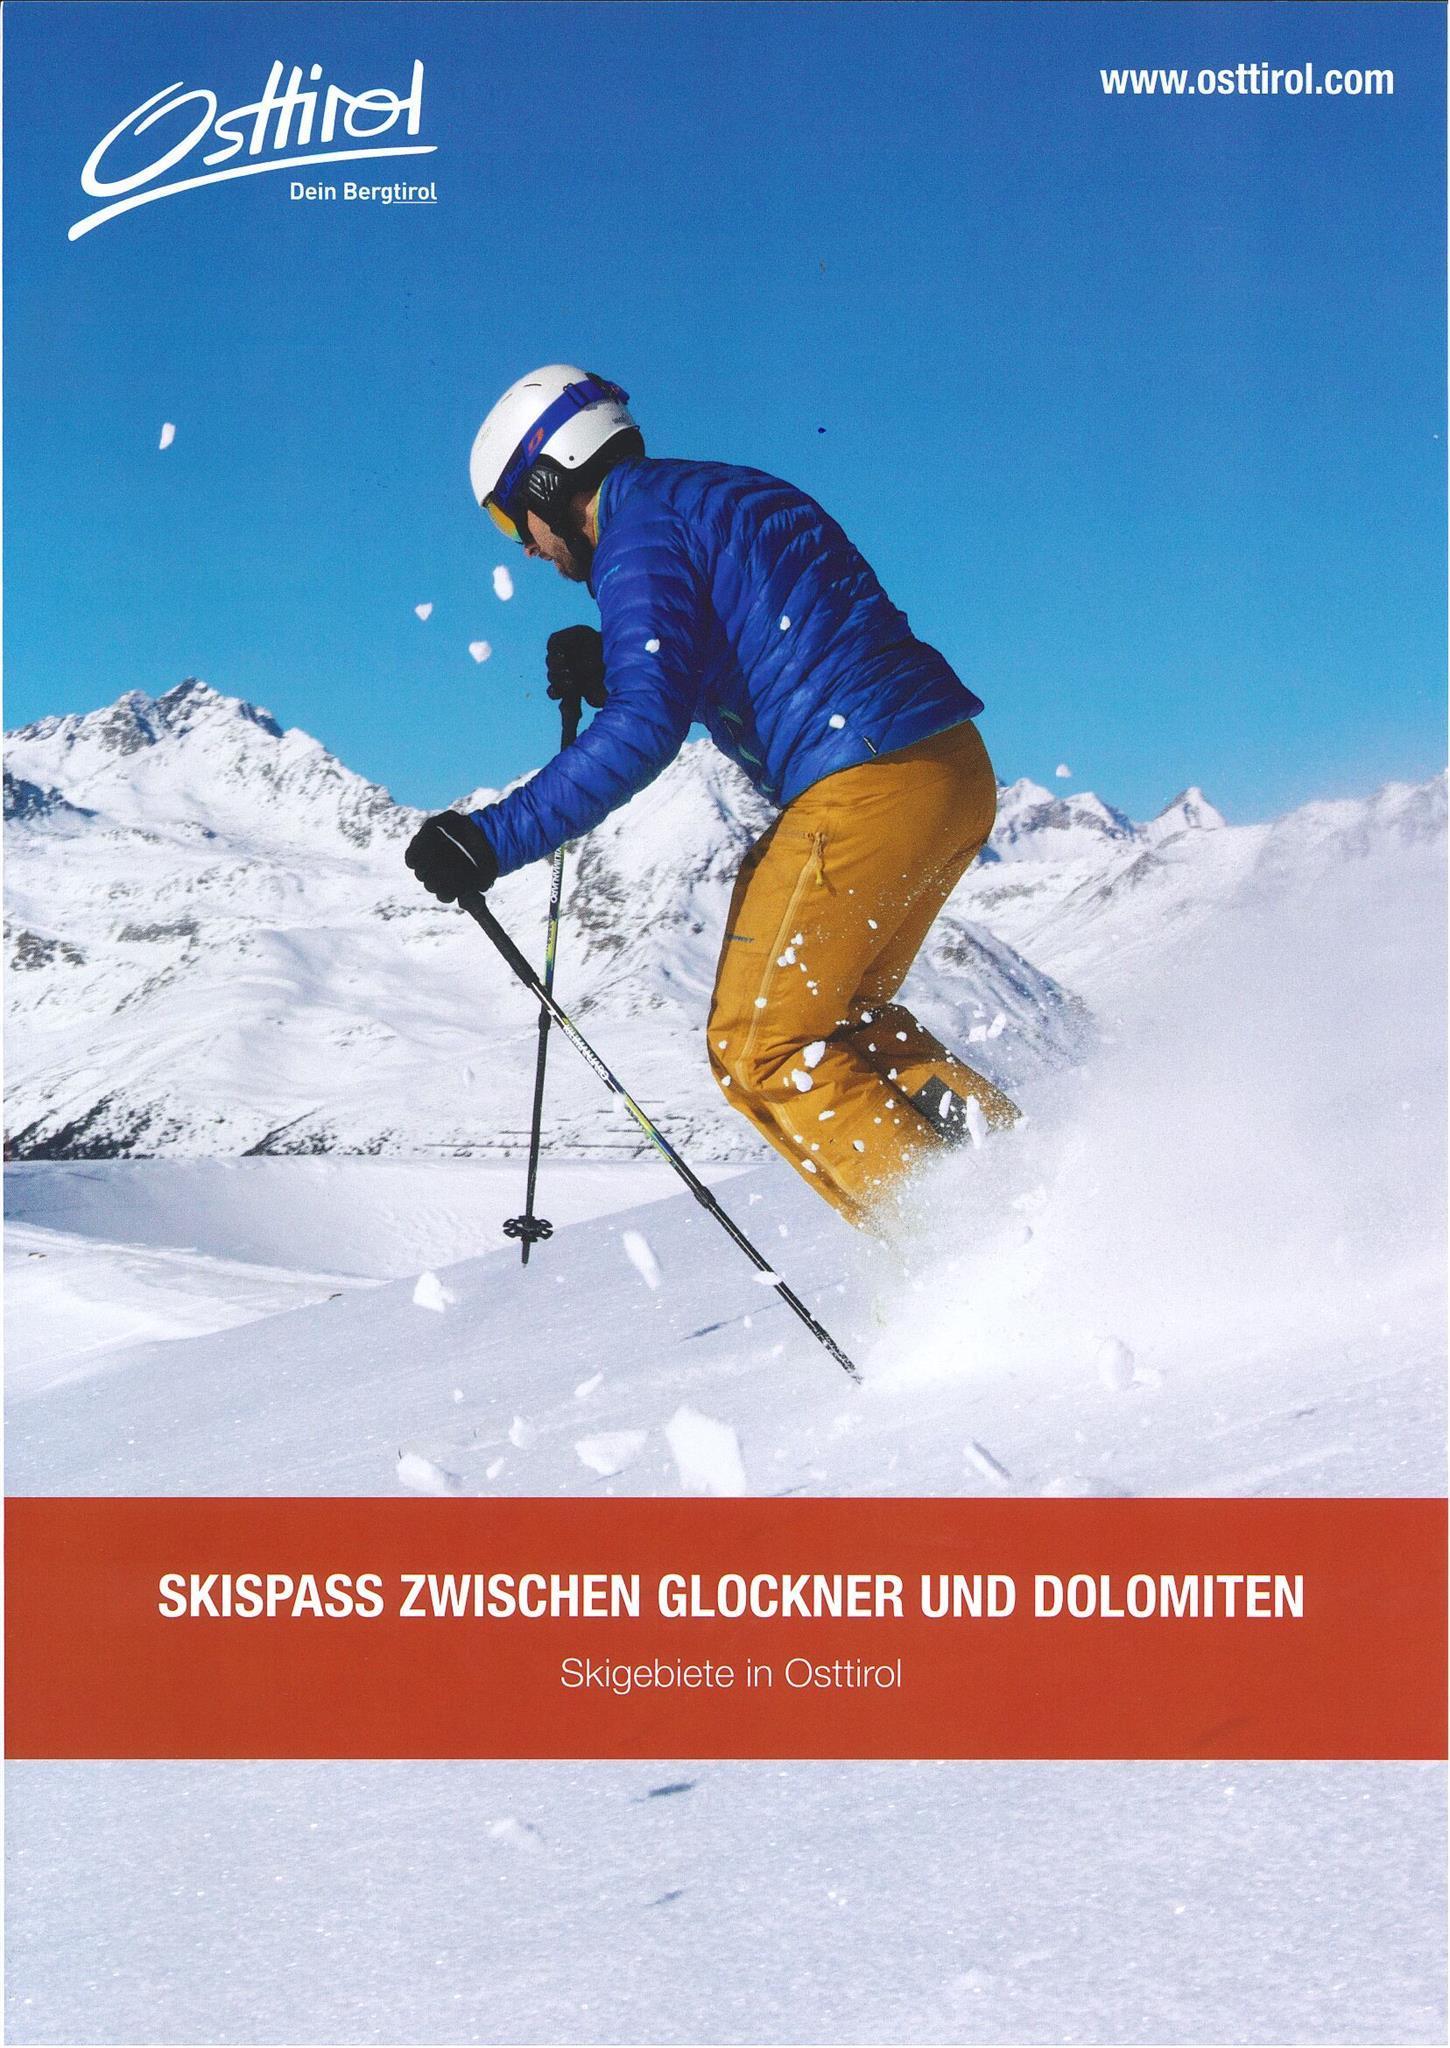 Skigebiete-in-Osttirol.jpg